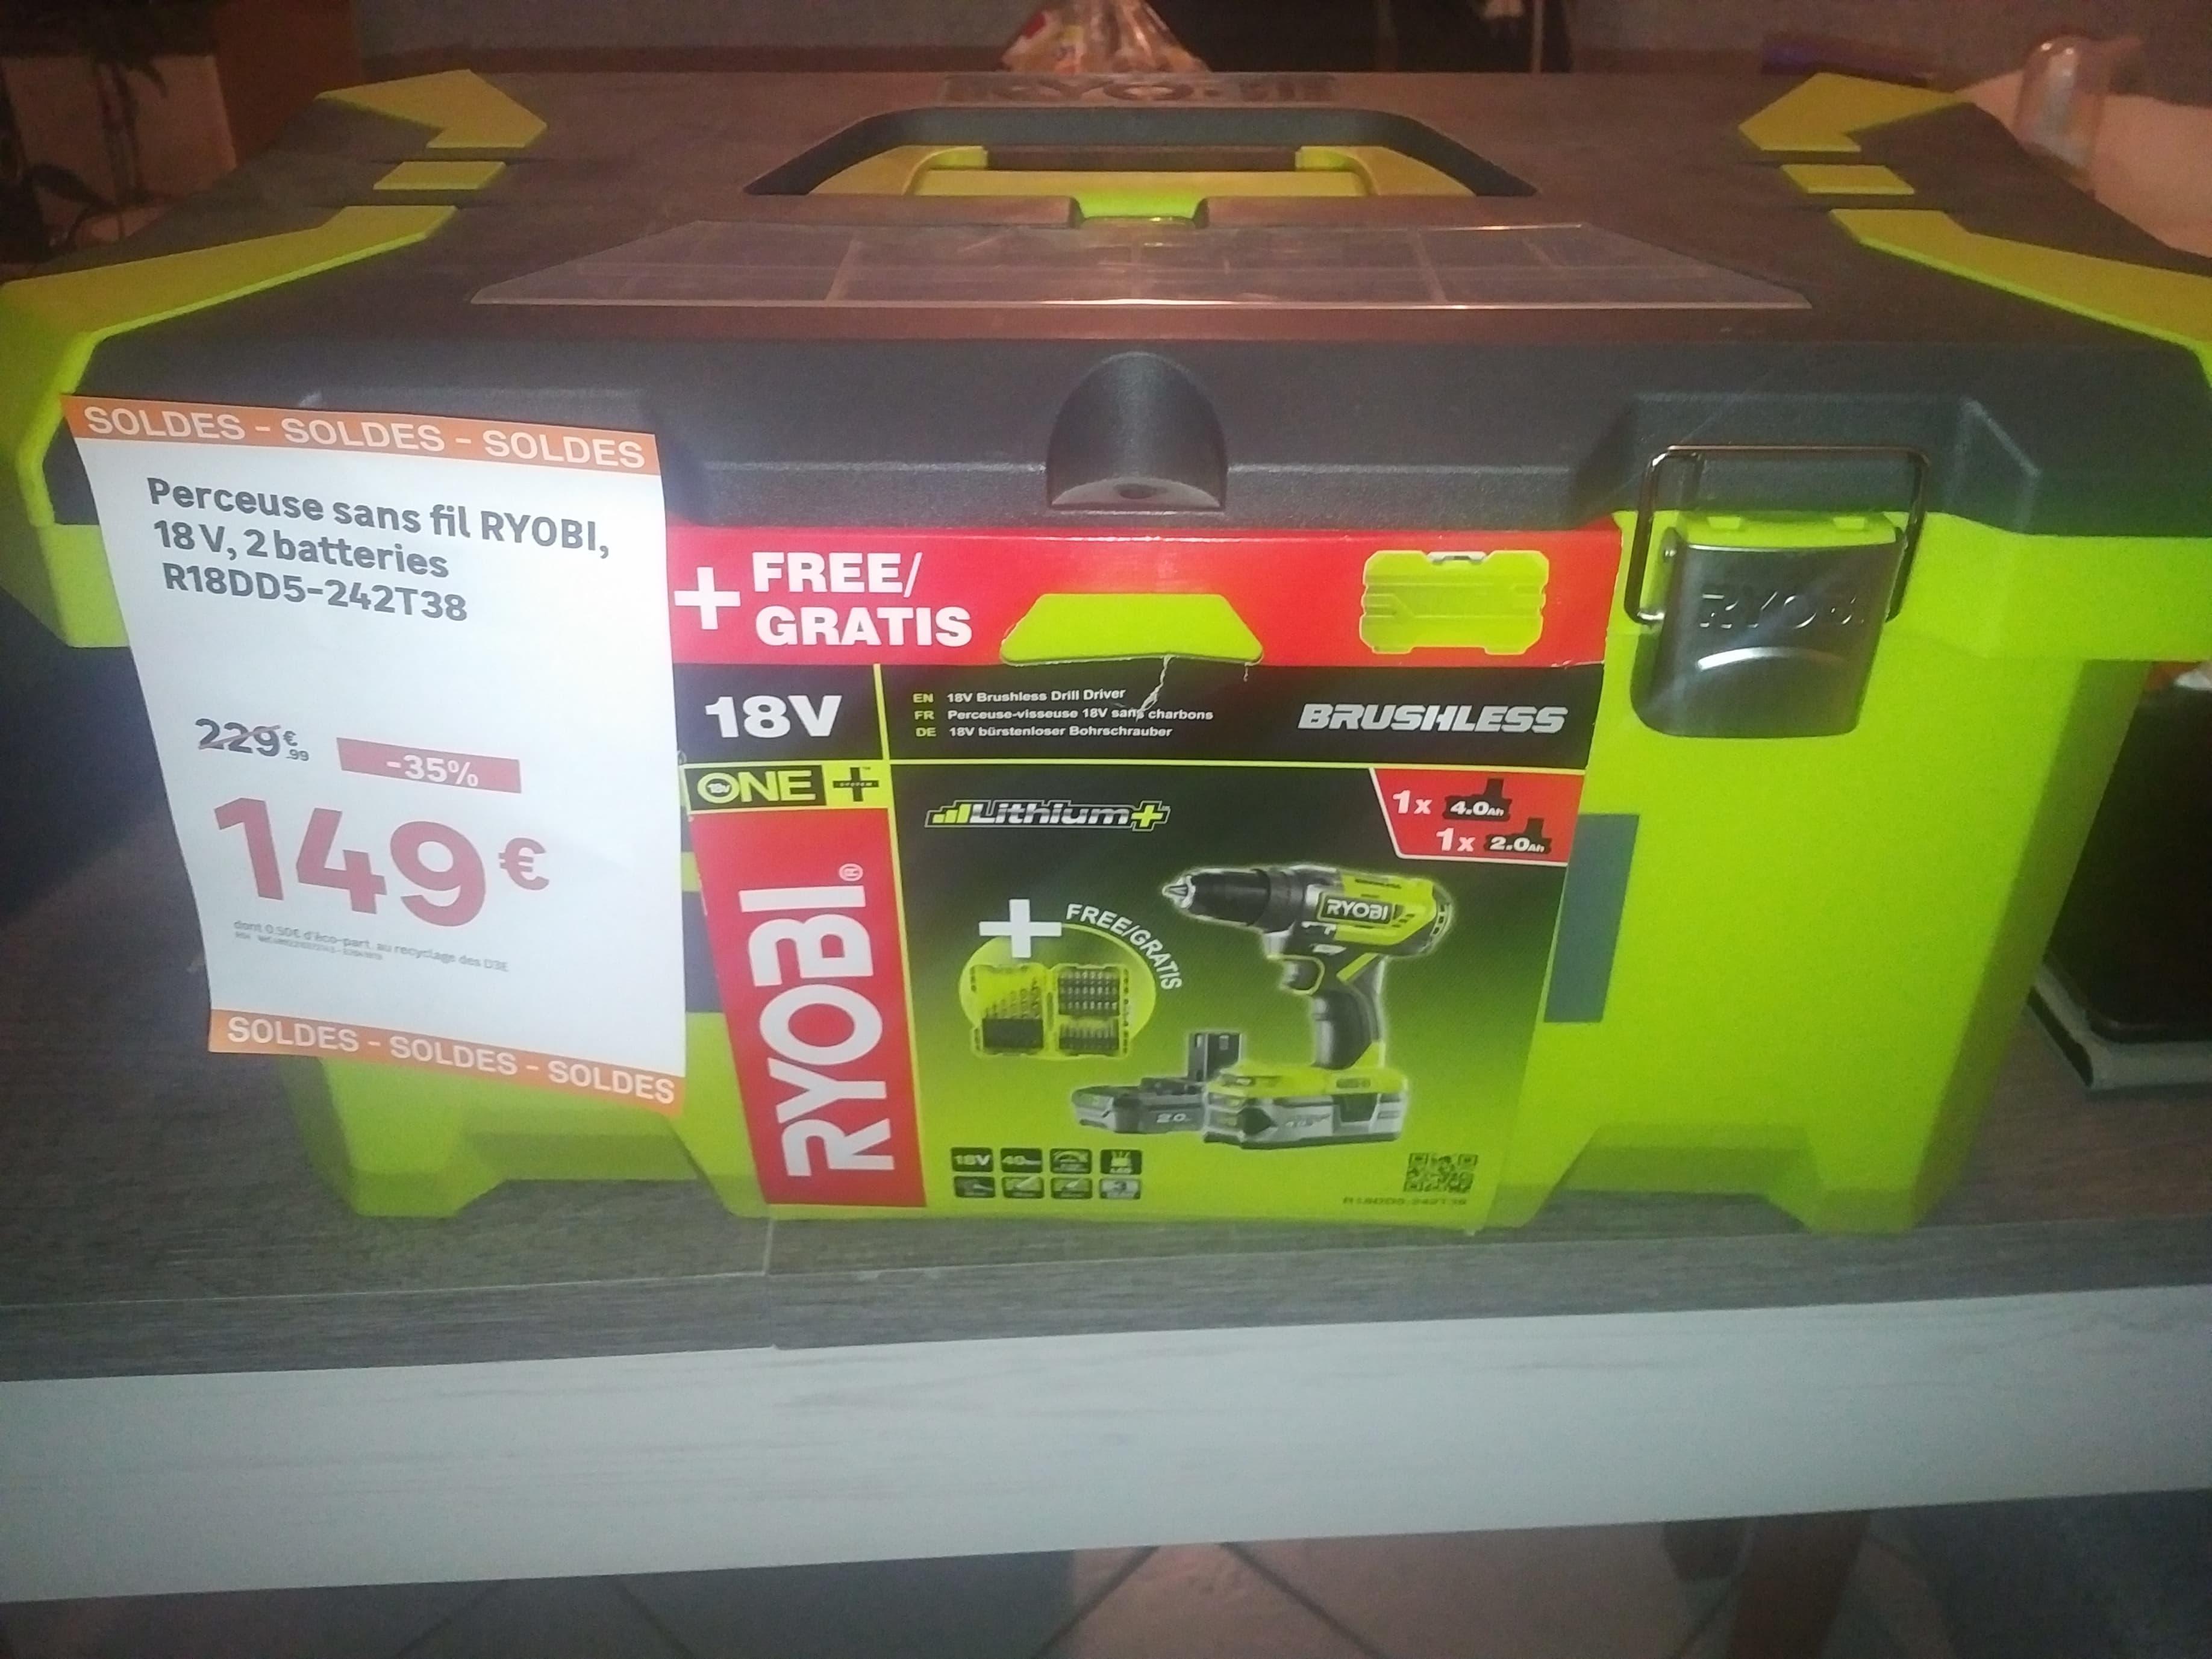 Perceuse Sans Fil Ryobi 18v2batteries R18dd5 242t38 Leroy